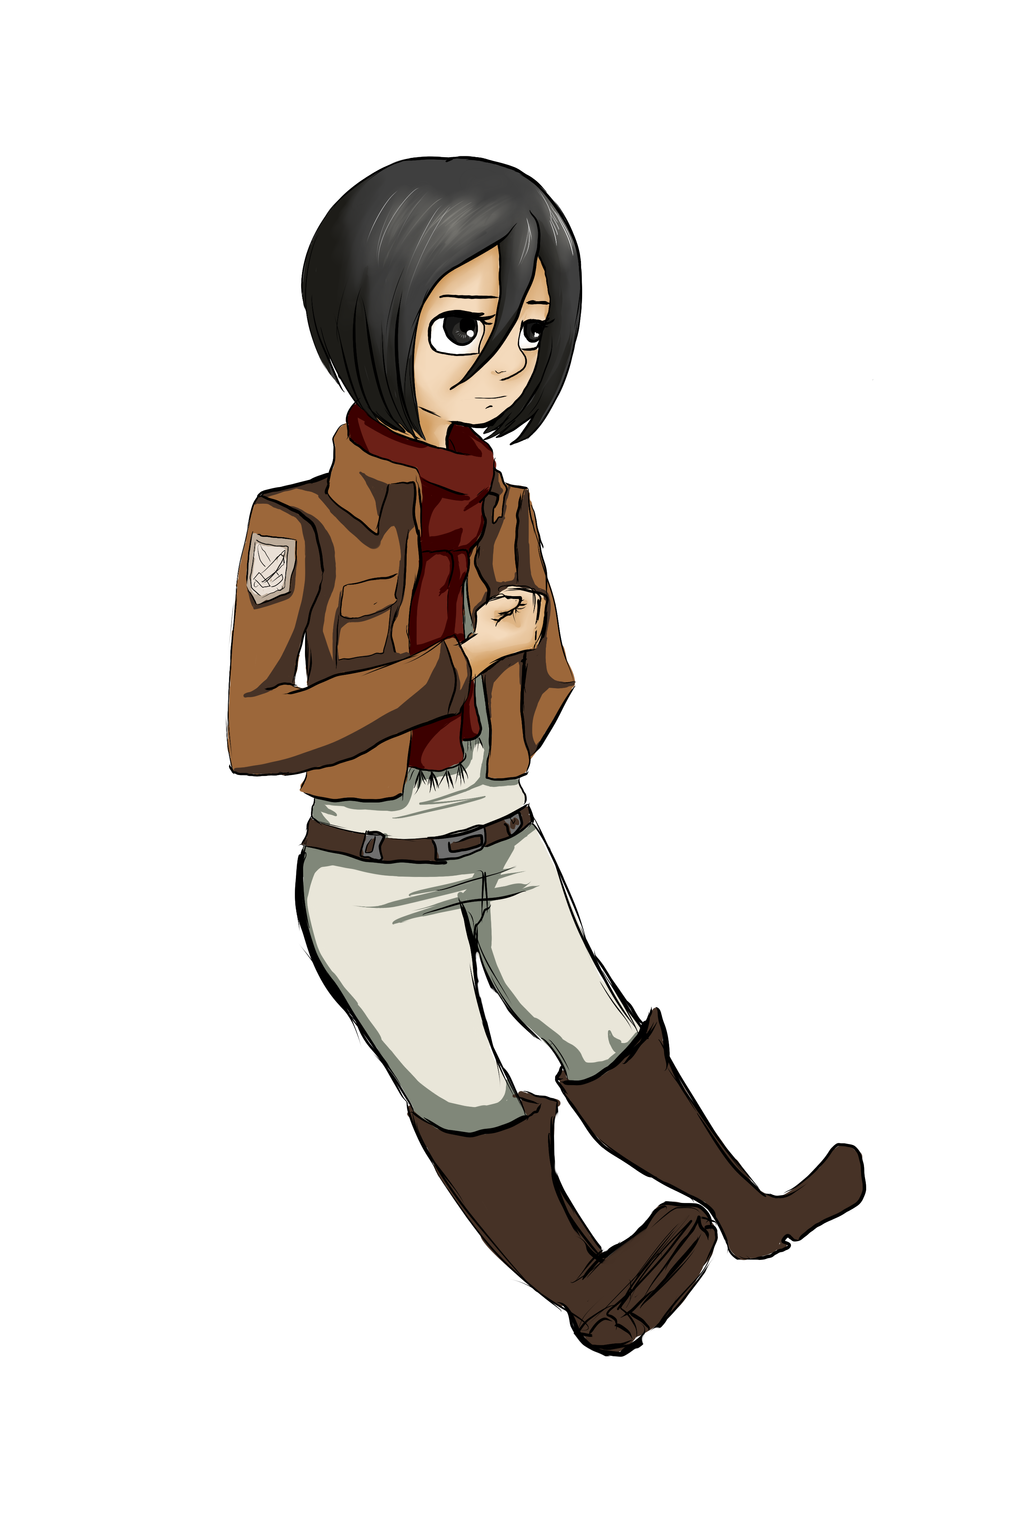 Mikasa by Neoro-Chan